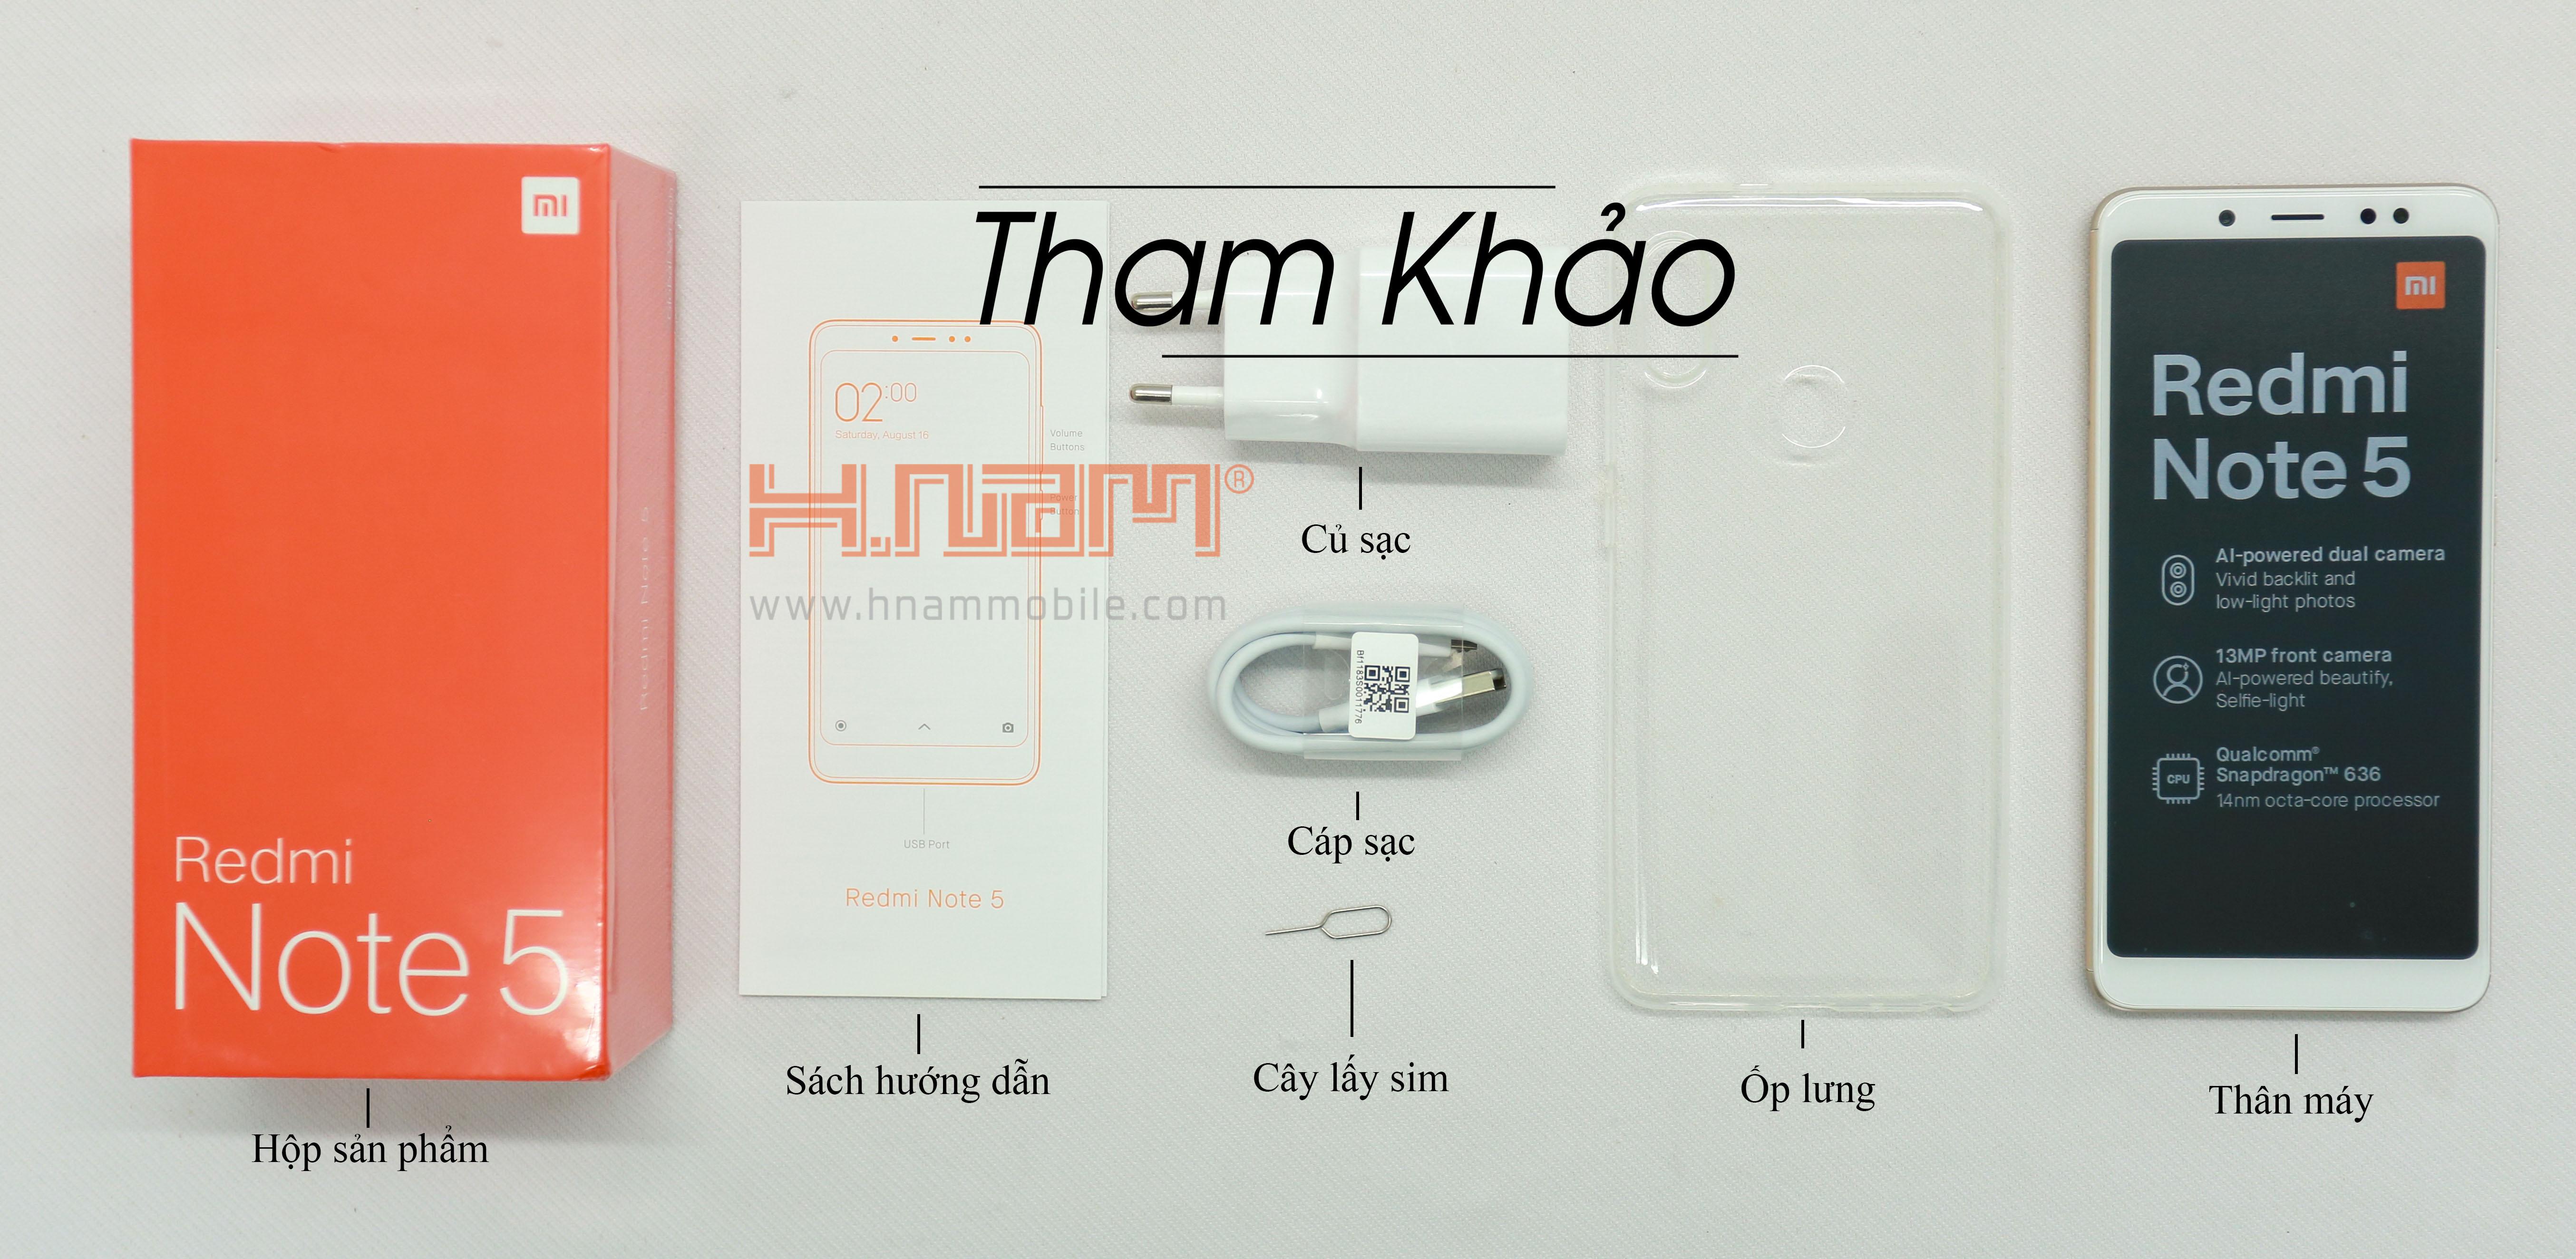 Xiaomi Redmi Note 5 64Gb Ram 4Gb Likenew hình sản phẩm 1